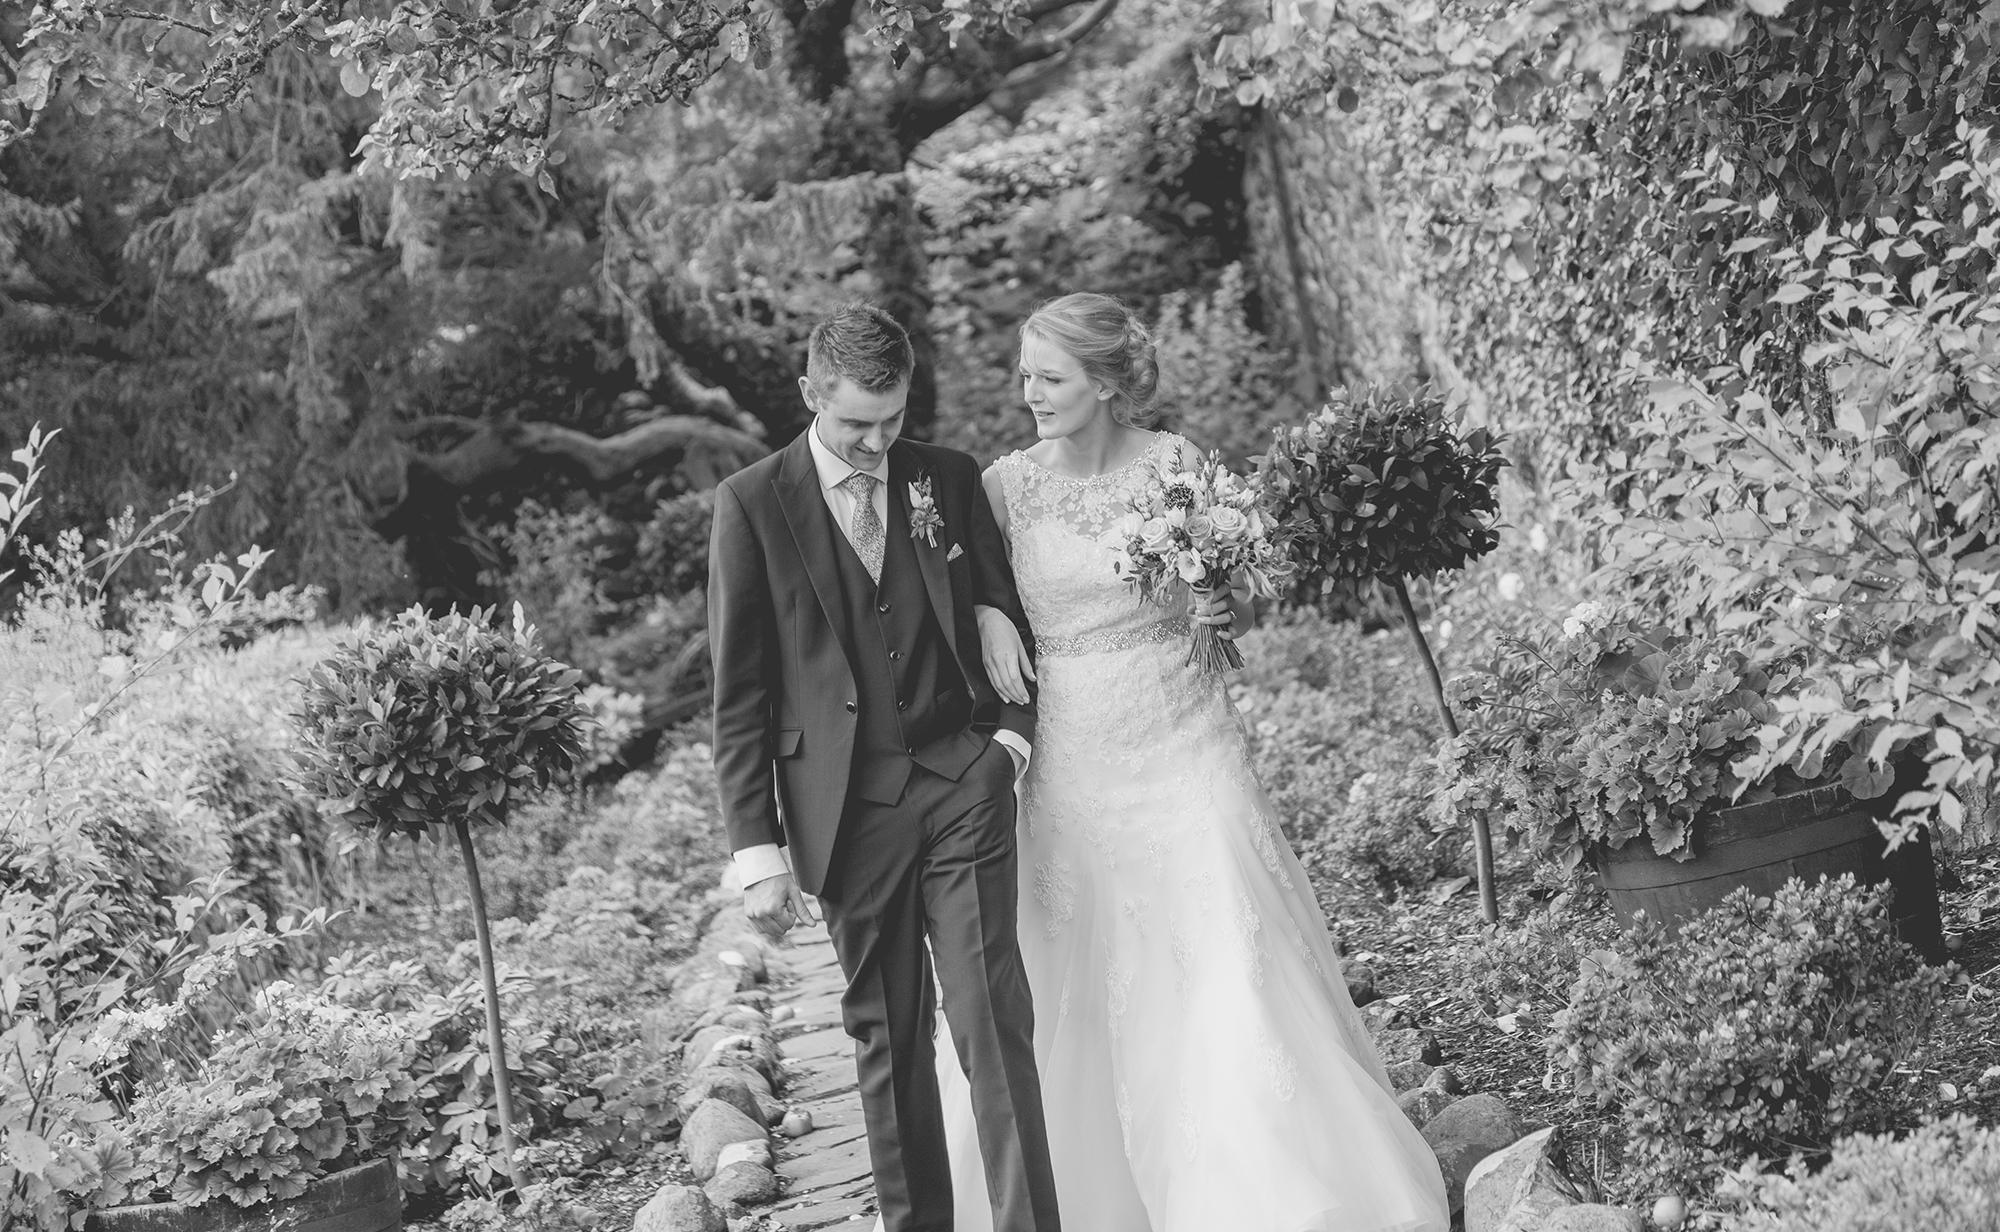 ballygally wedding photography tc photography larne belfast lisburn 15